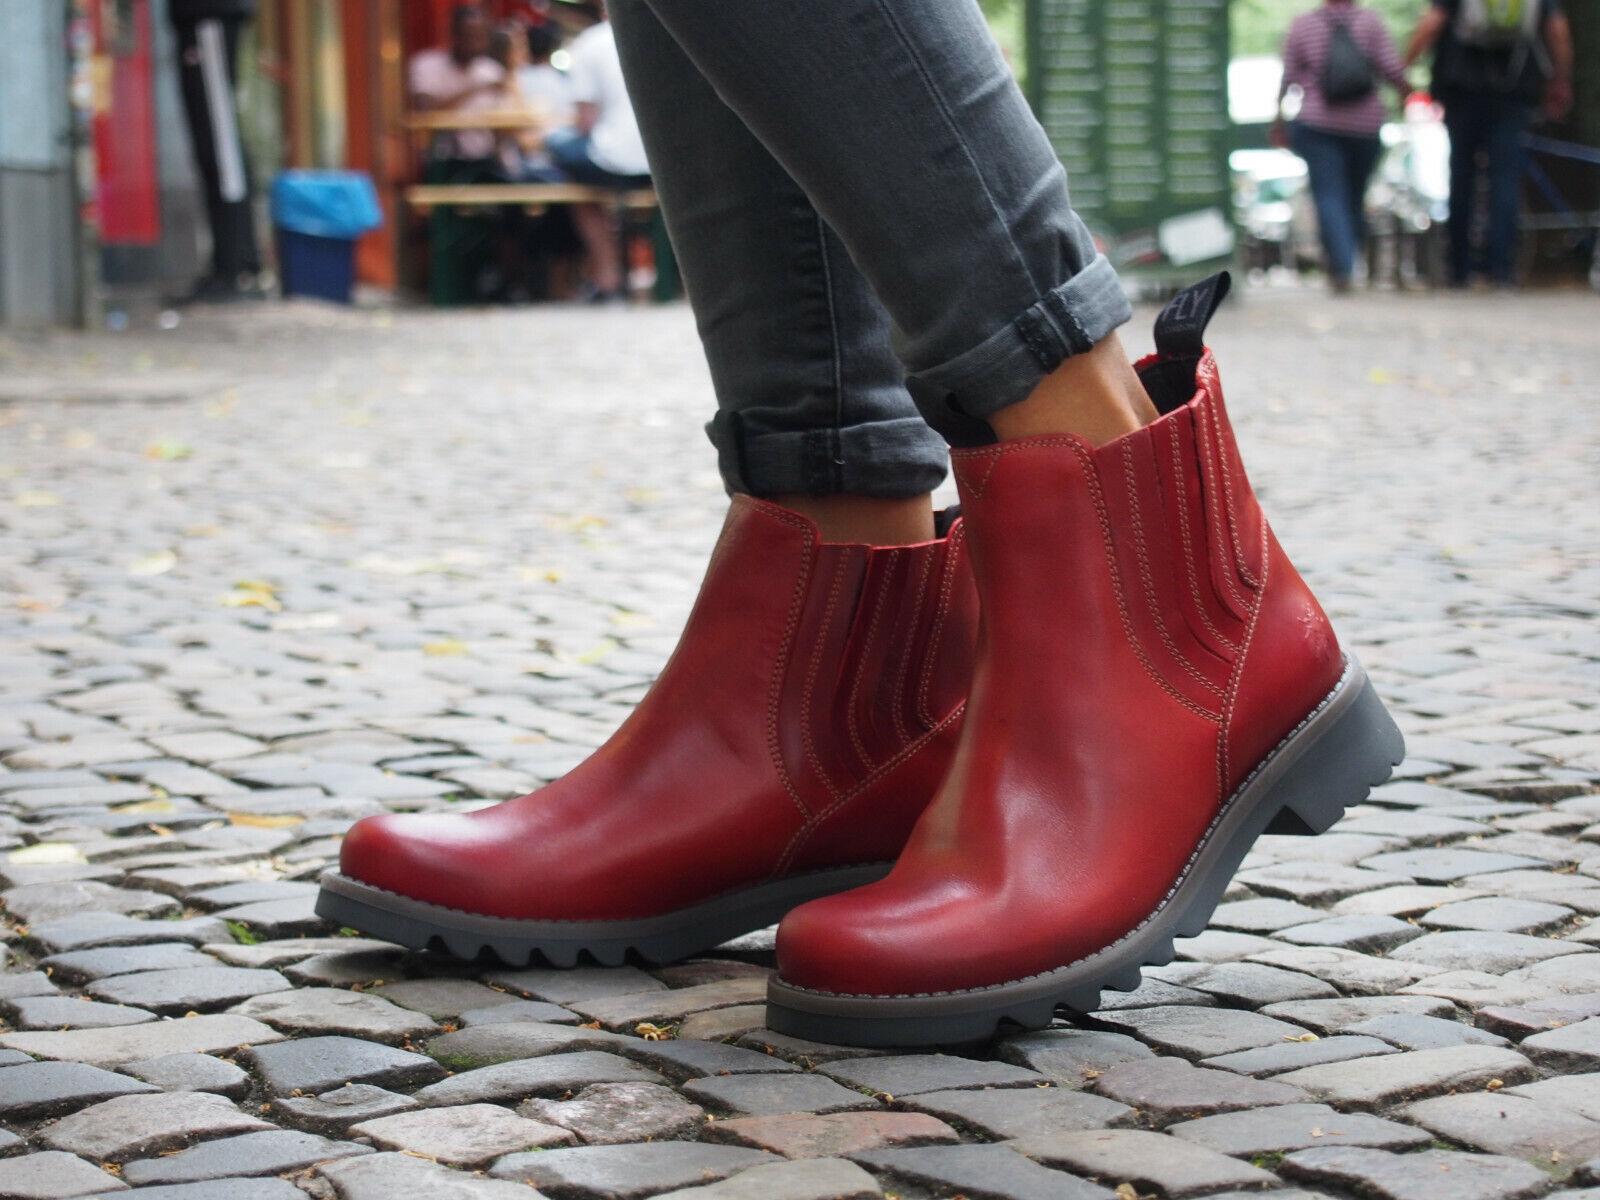 Chelsea RALT London FLY Stiefel Rot NEU Schuh Echtleder